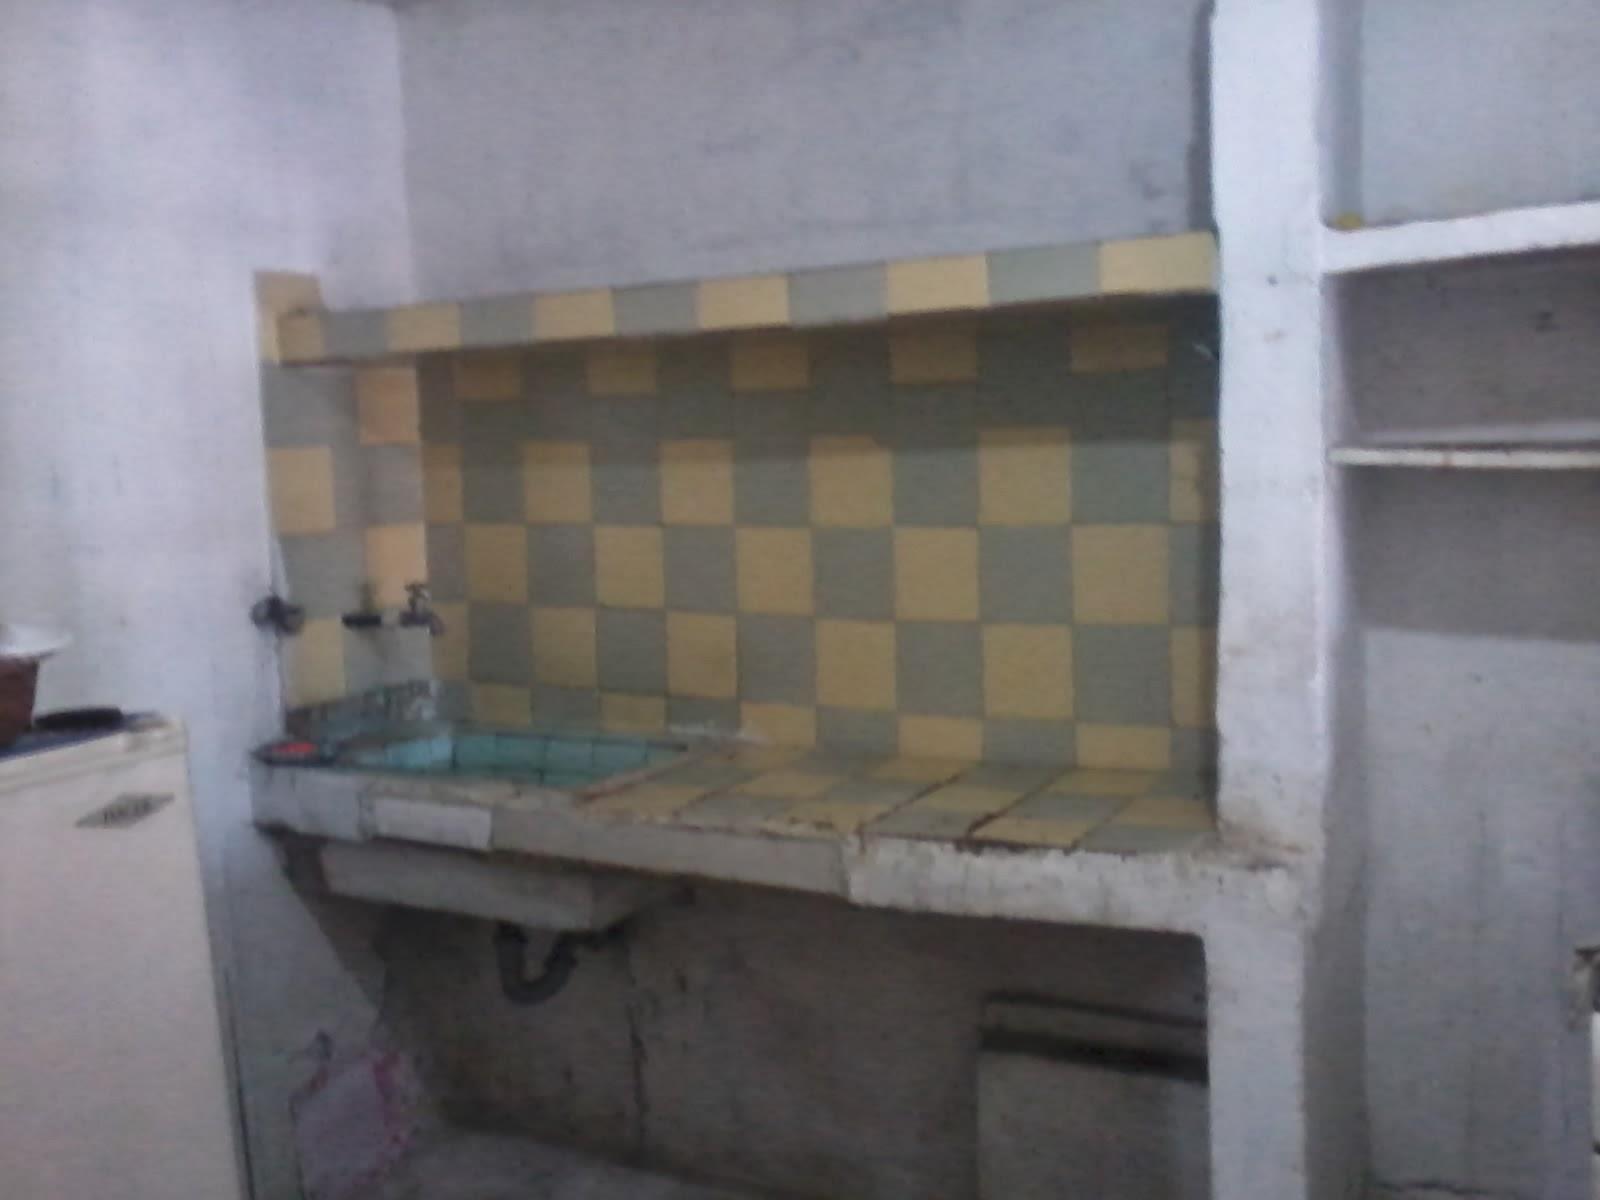 Reparaci n remodelaci n e instalaci n de cocinas integrales - Instalacion de cocinas integrales ...